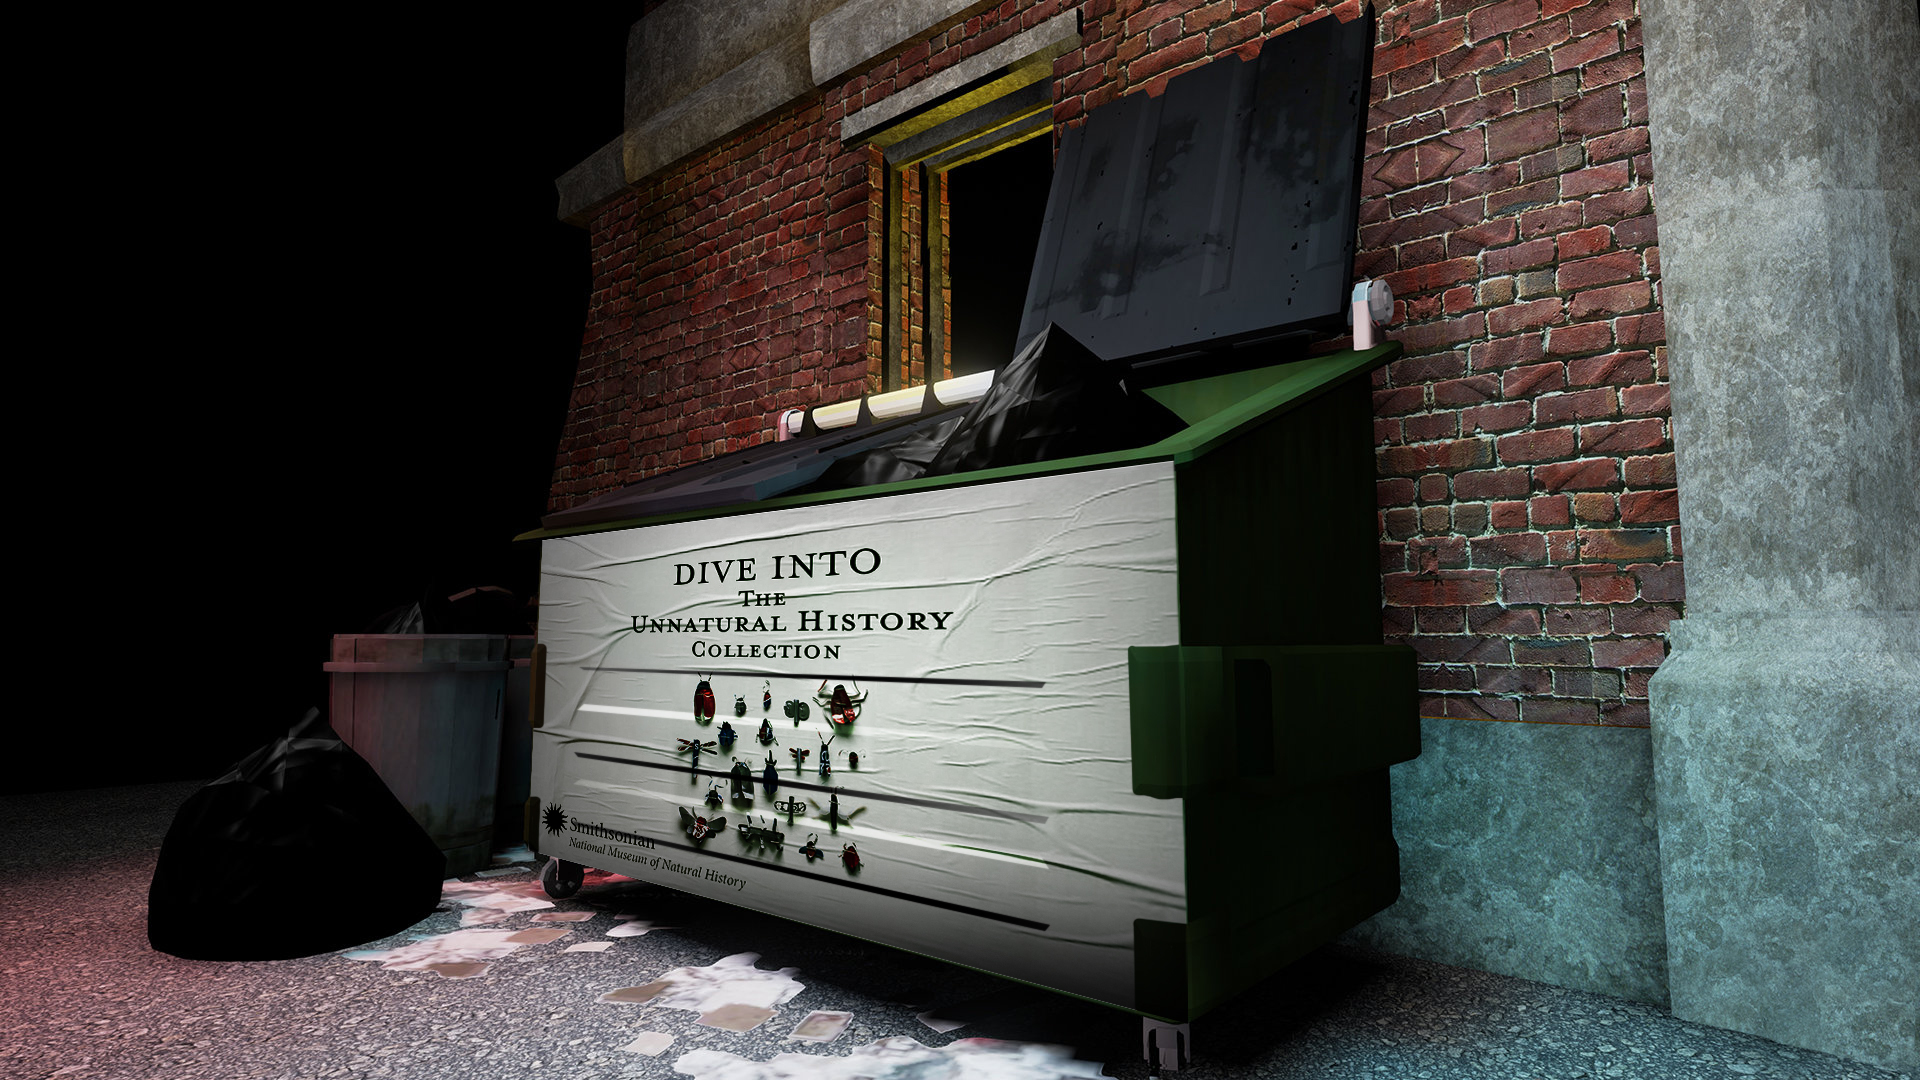 dumpster copy.jpg